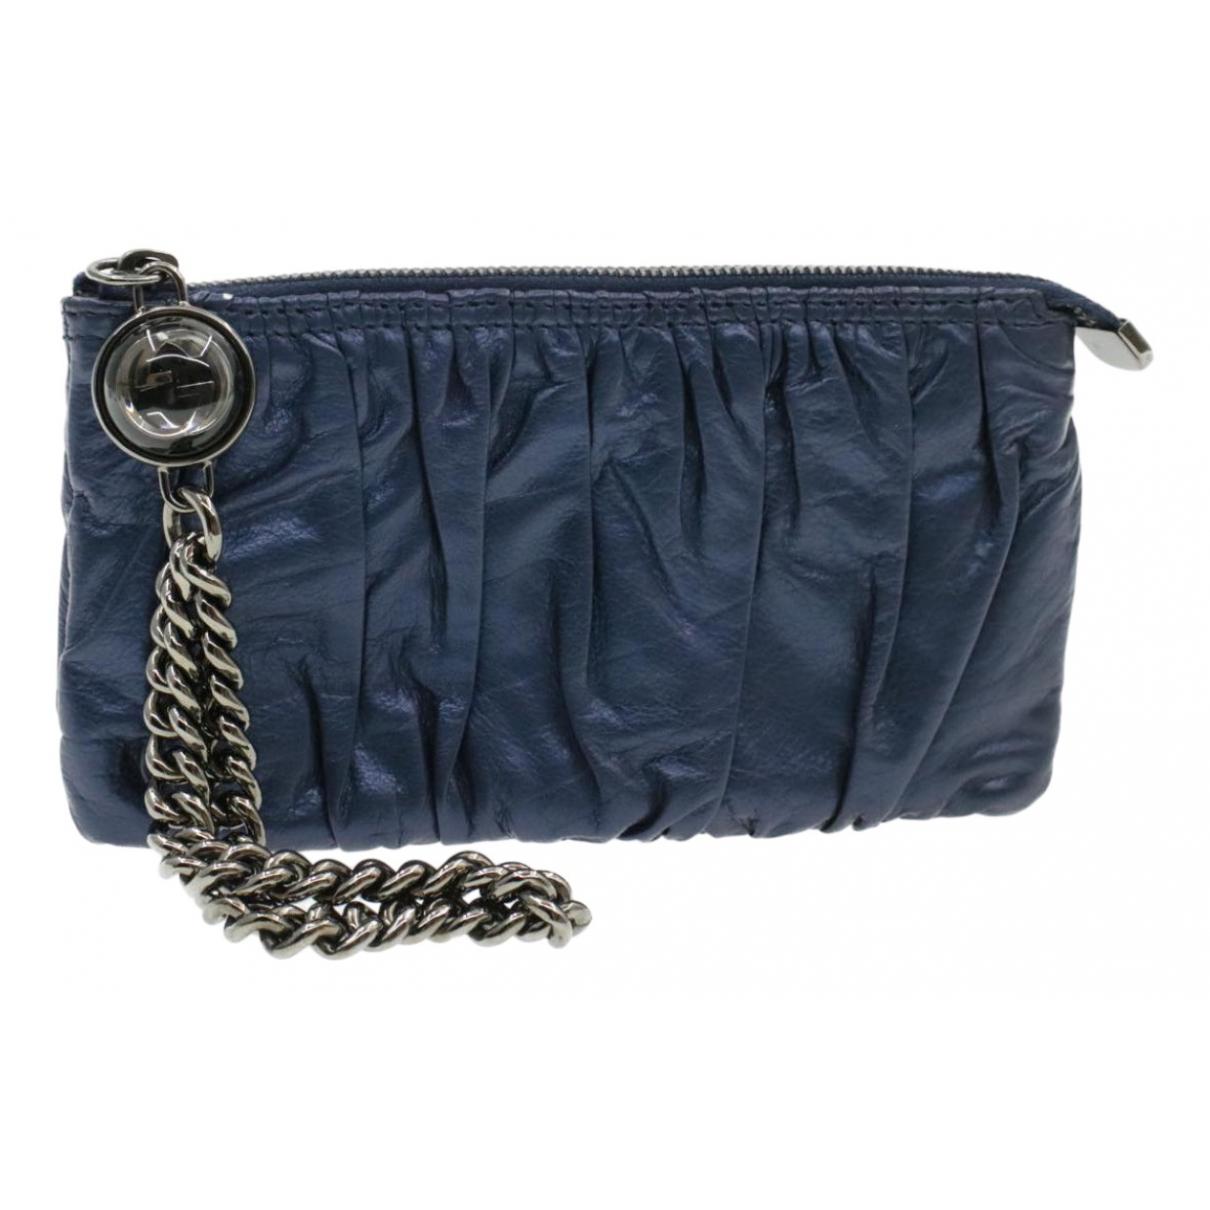 Gucci N Blue Leather Clutch bag for Women N